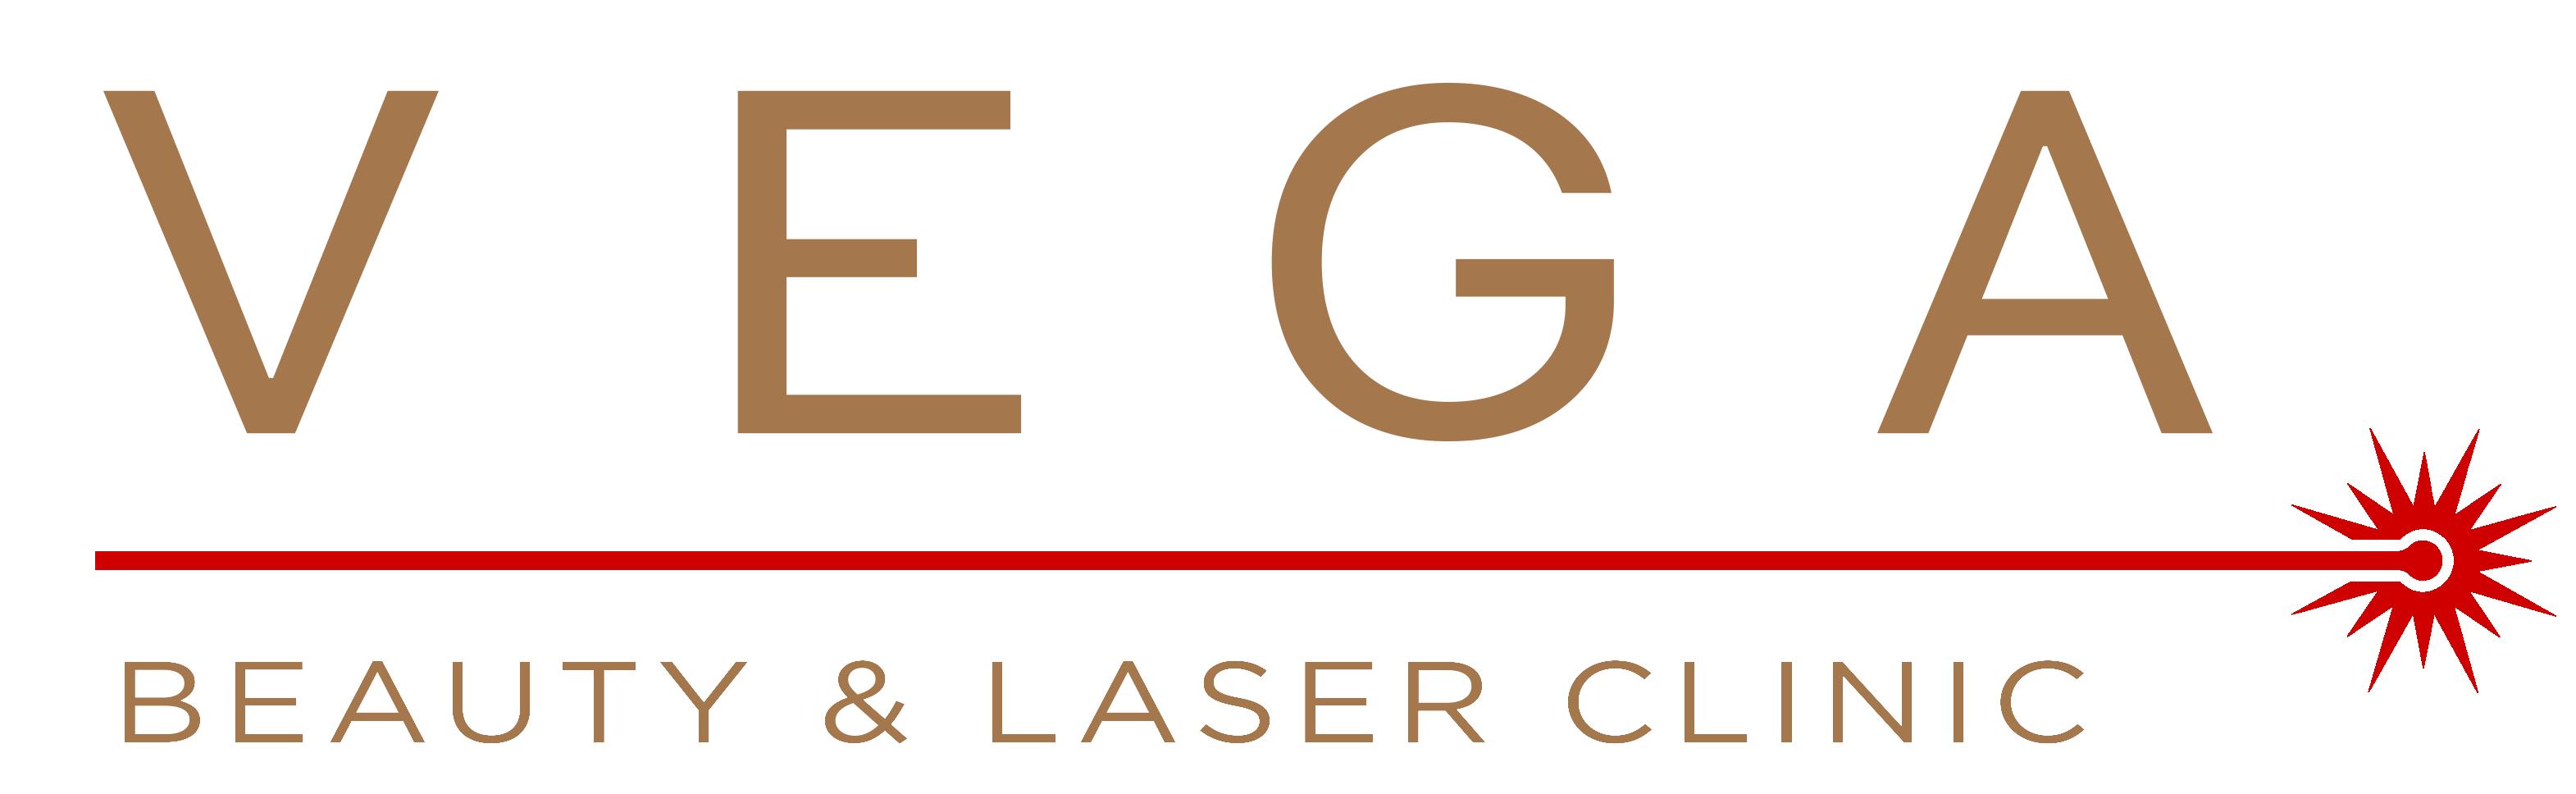 Electrolysis - Vega Clinic